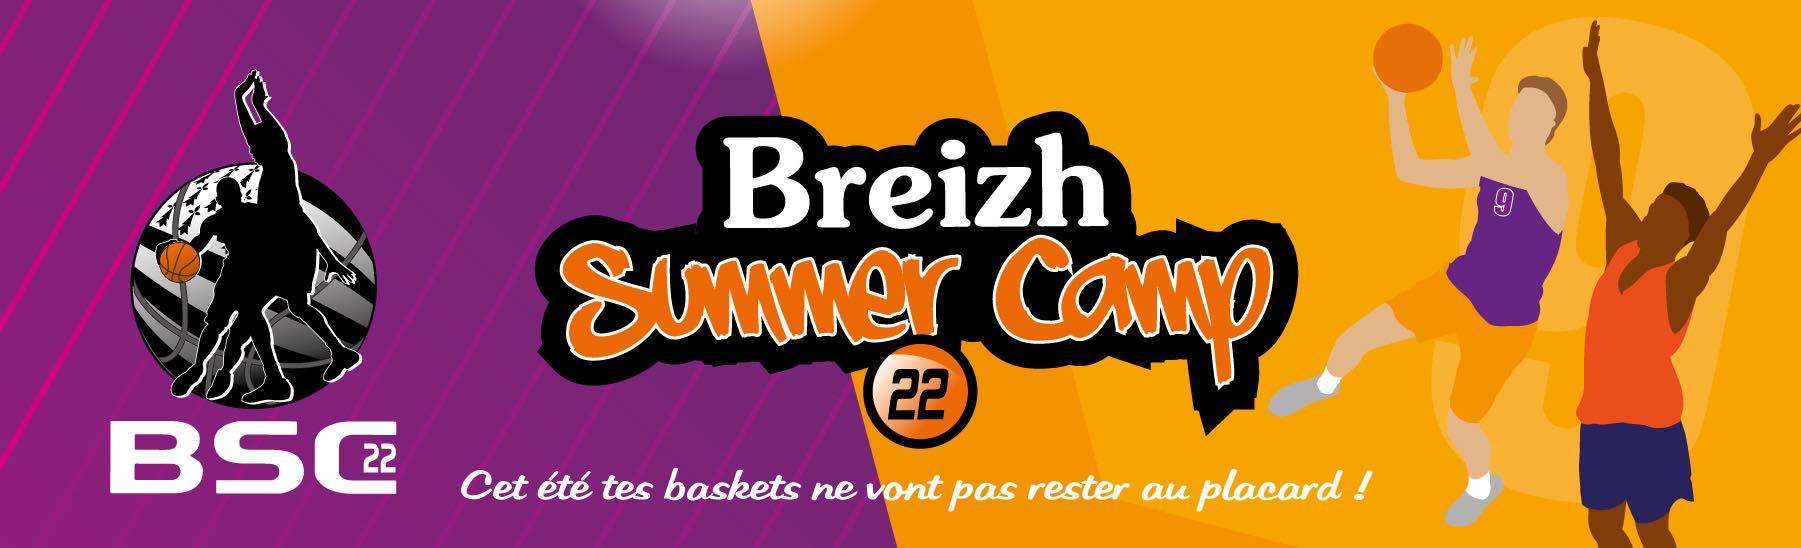 Breizh Summer Camp 22